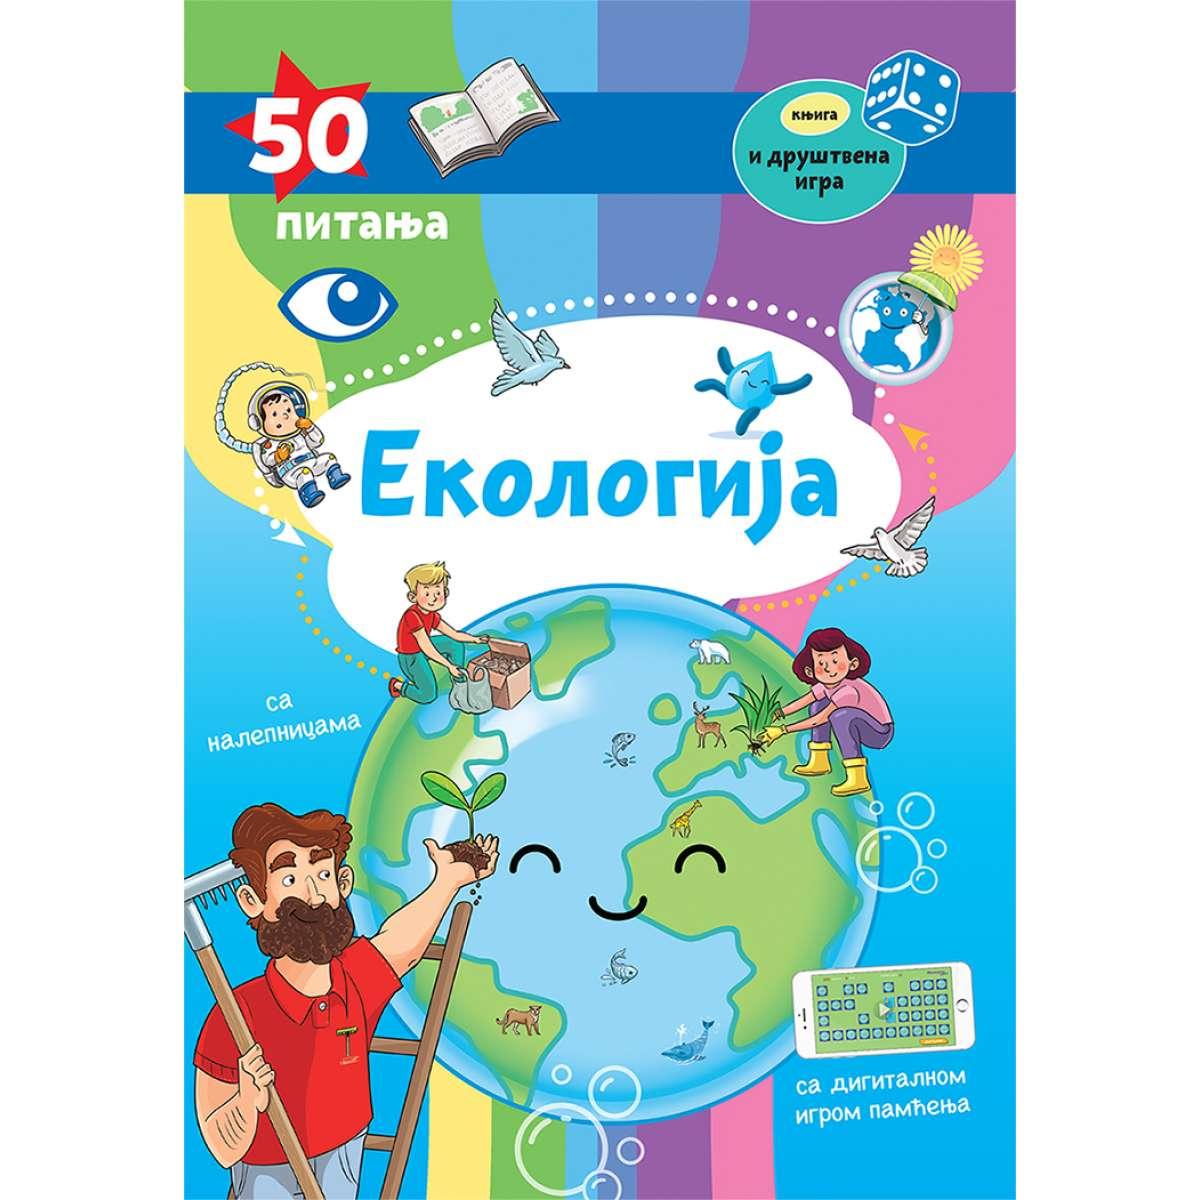 50 pitanja - Ekologija